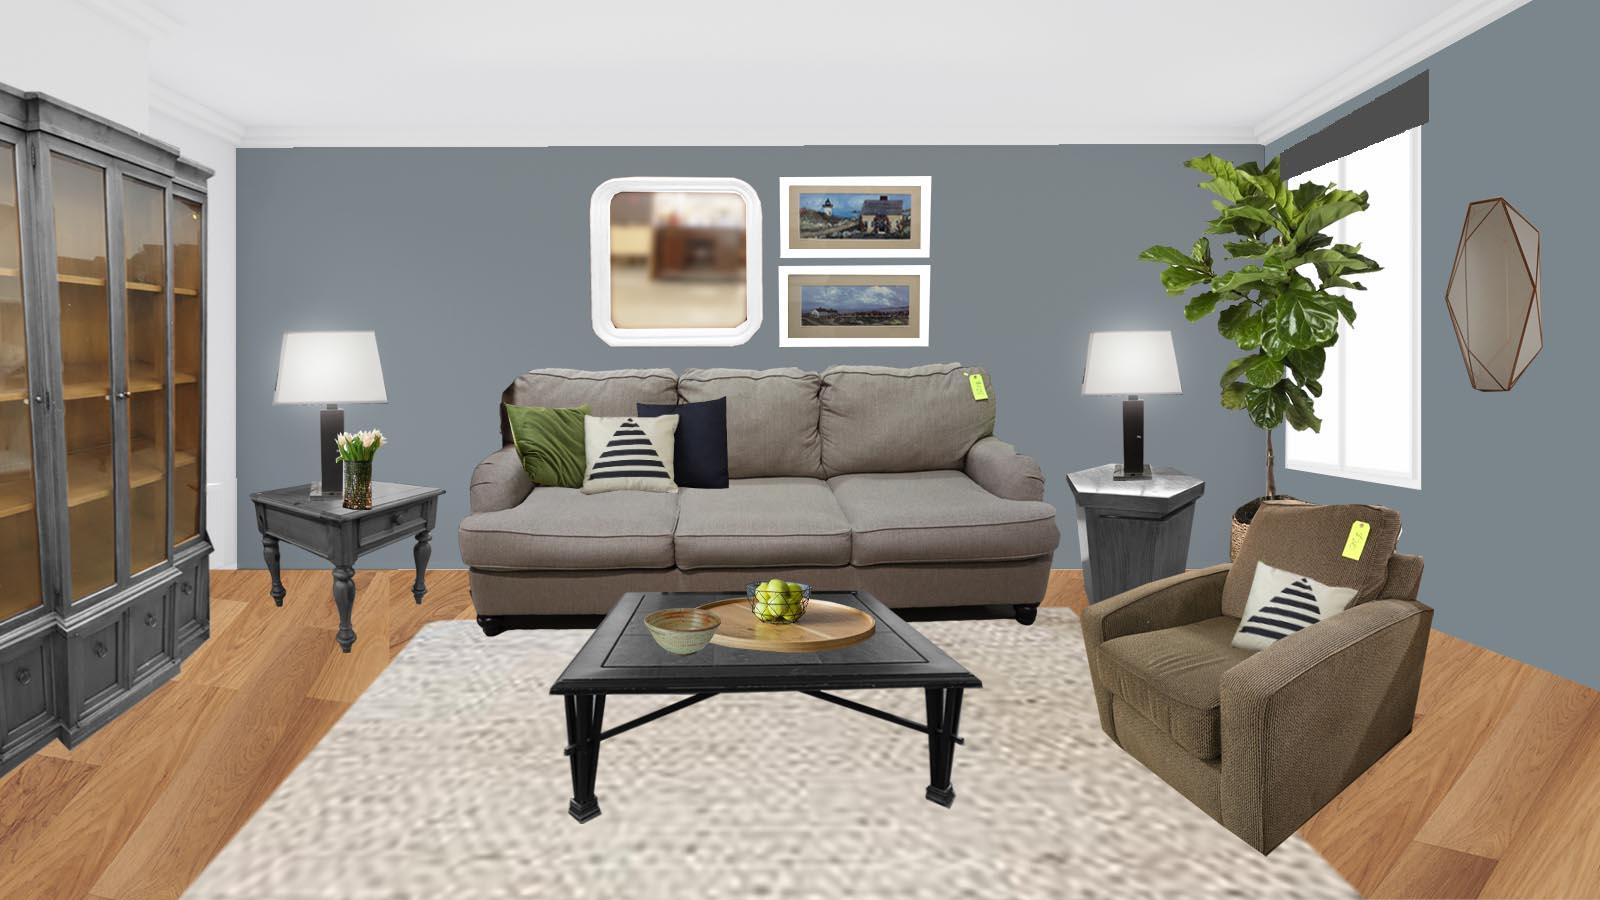 Home design - living room